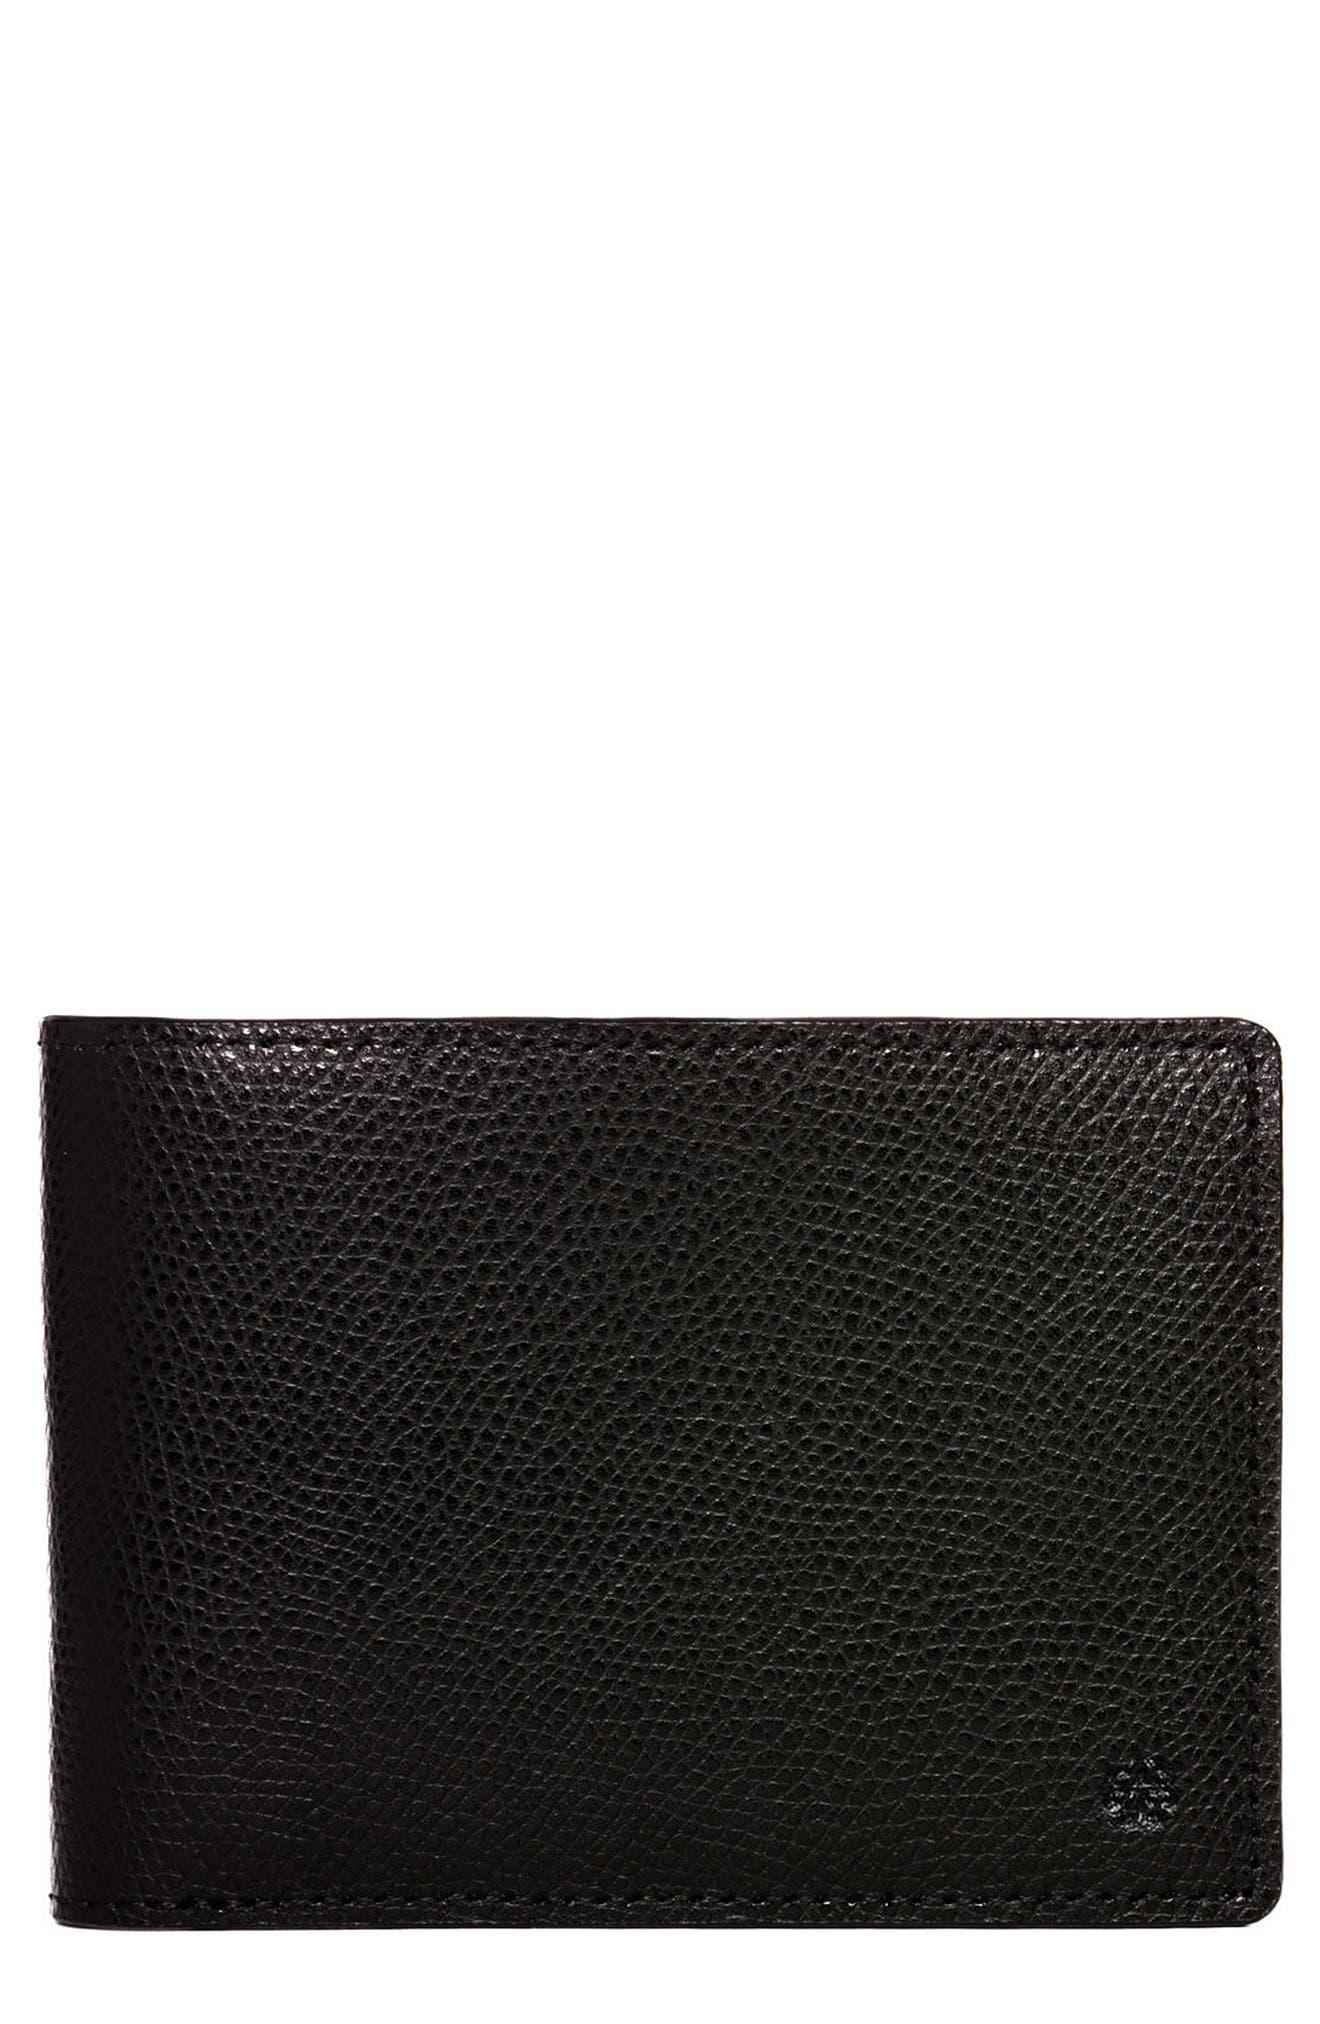 hook + ALBERT Leather Wallet